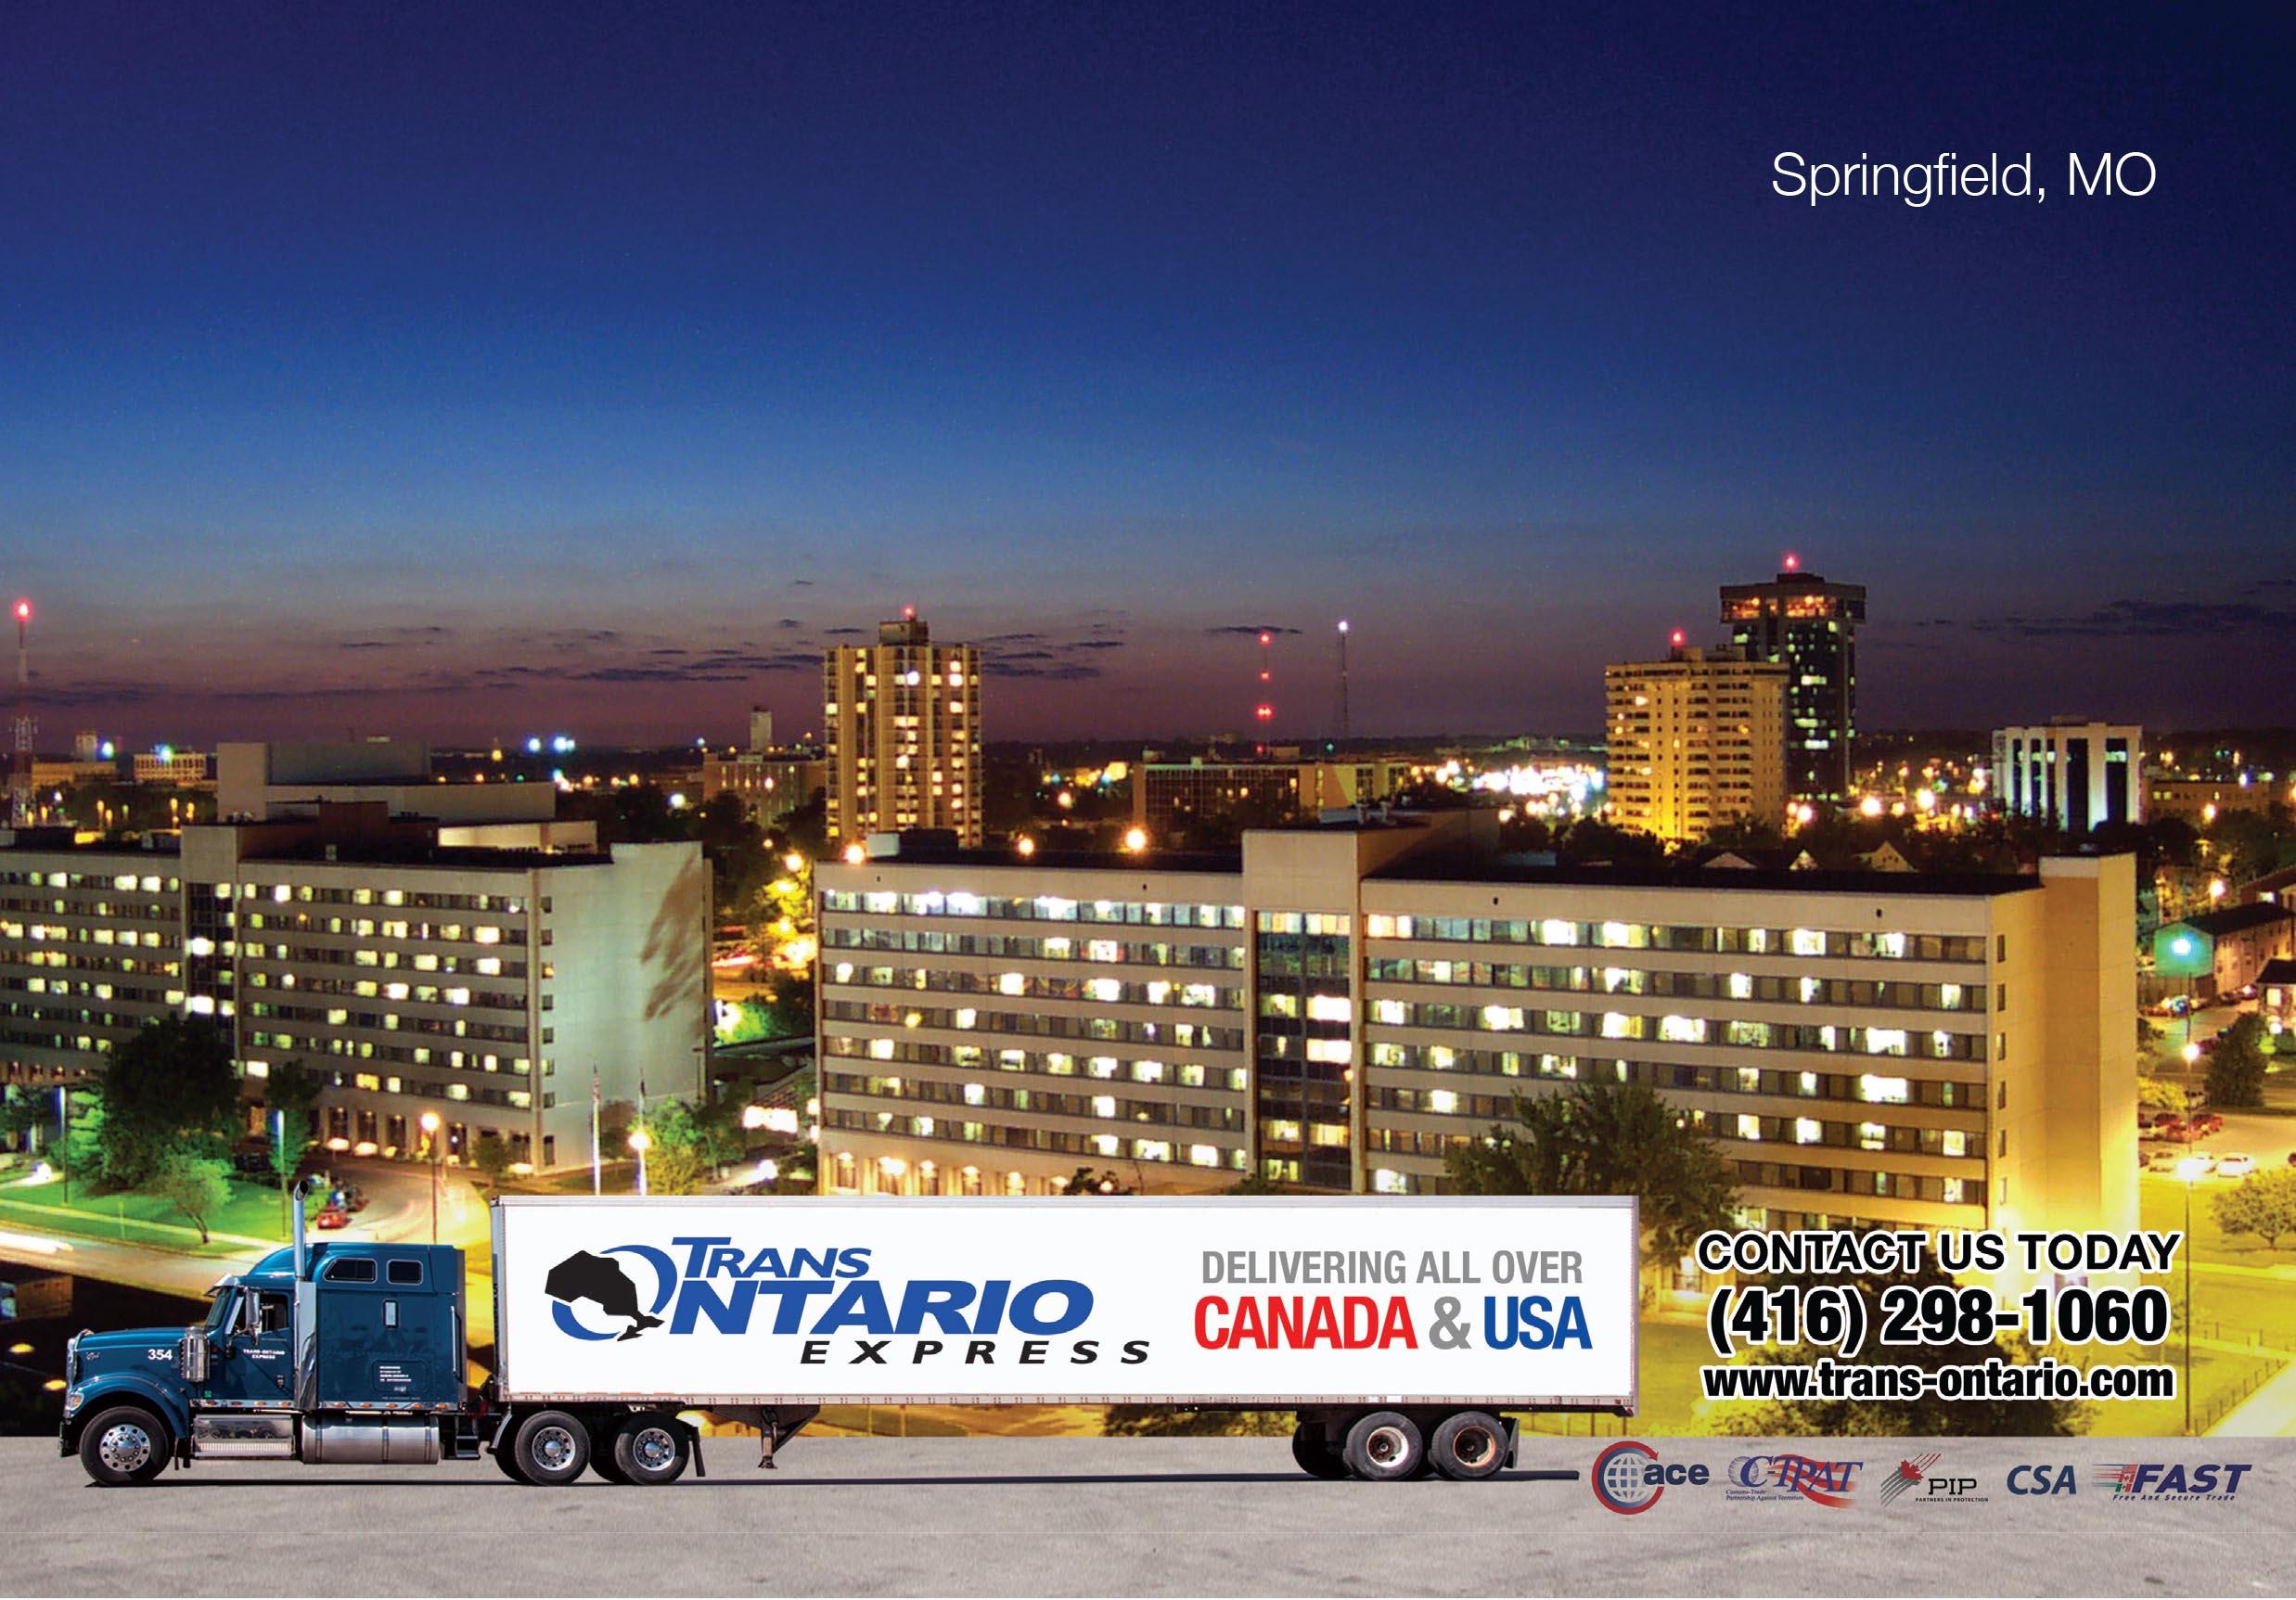 Toronto Canada Springfield Mo Shipping Trucking Freight